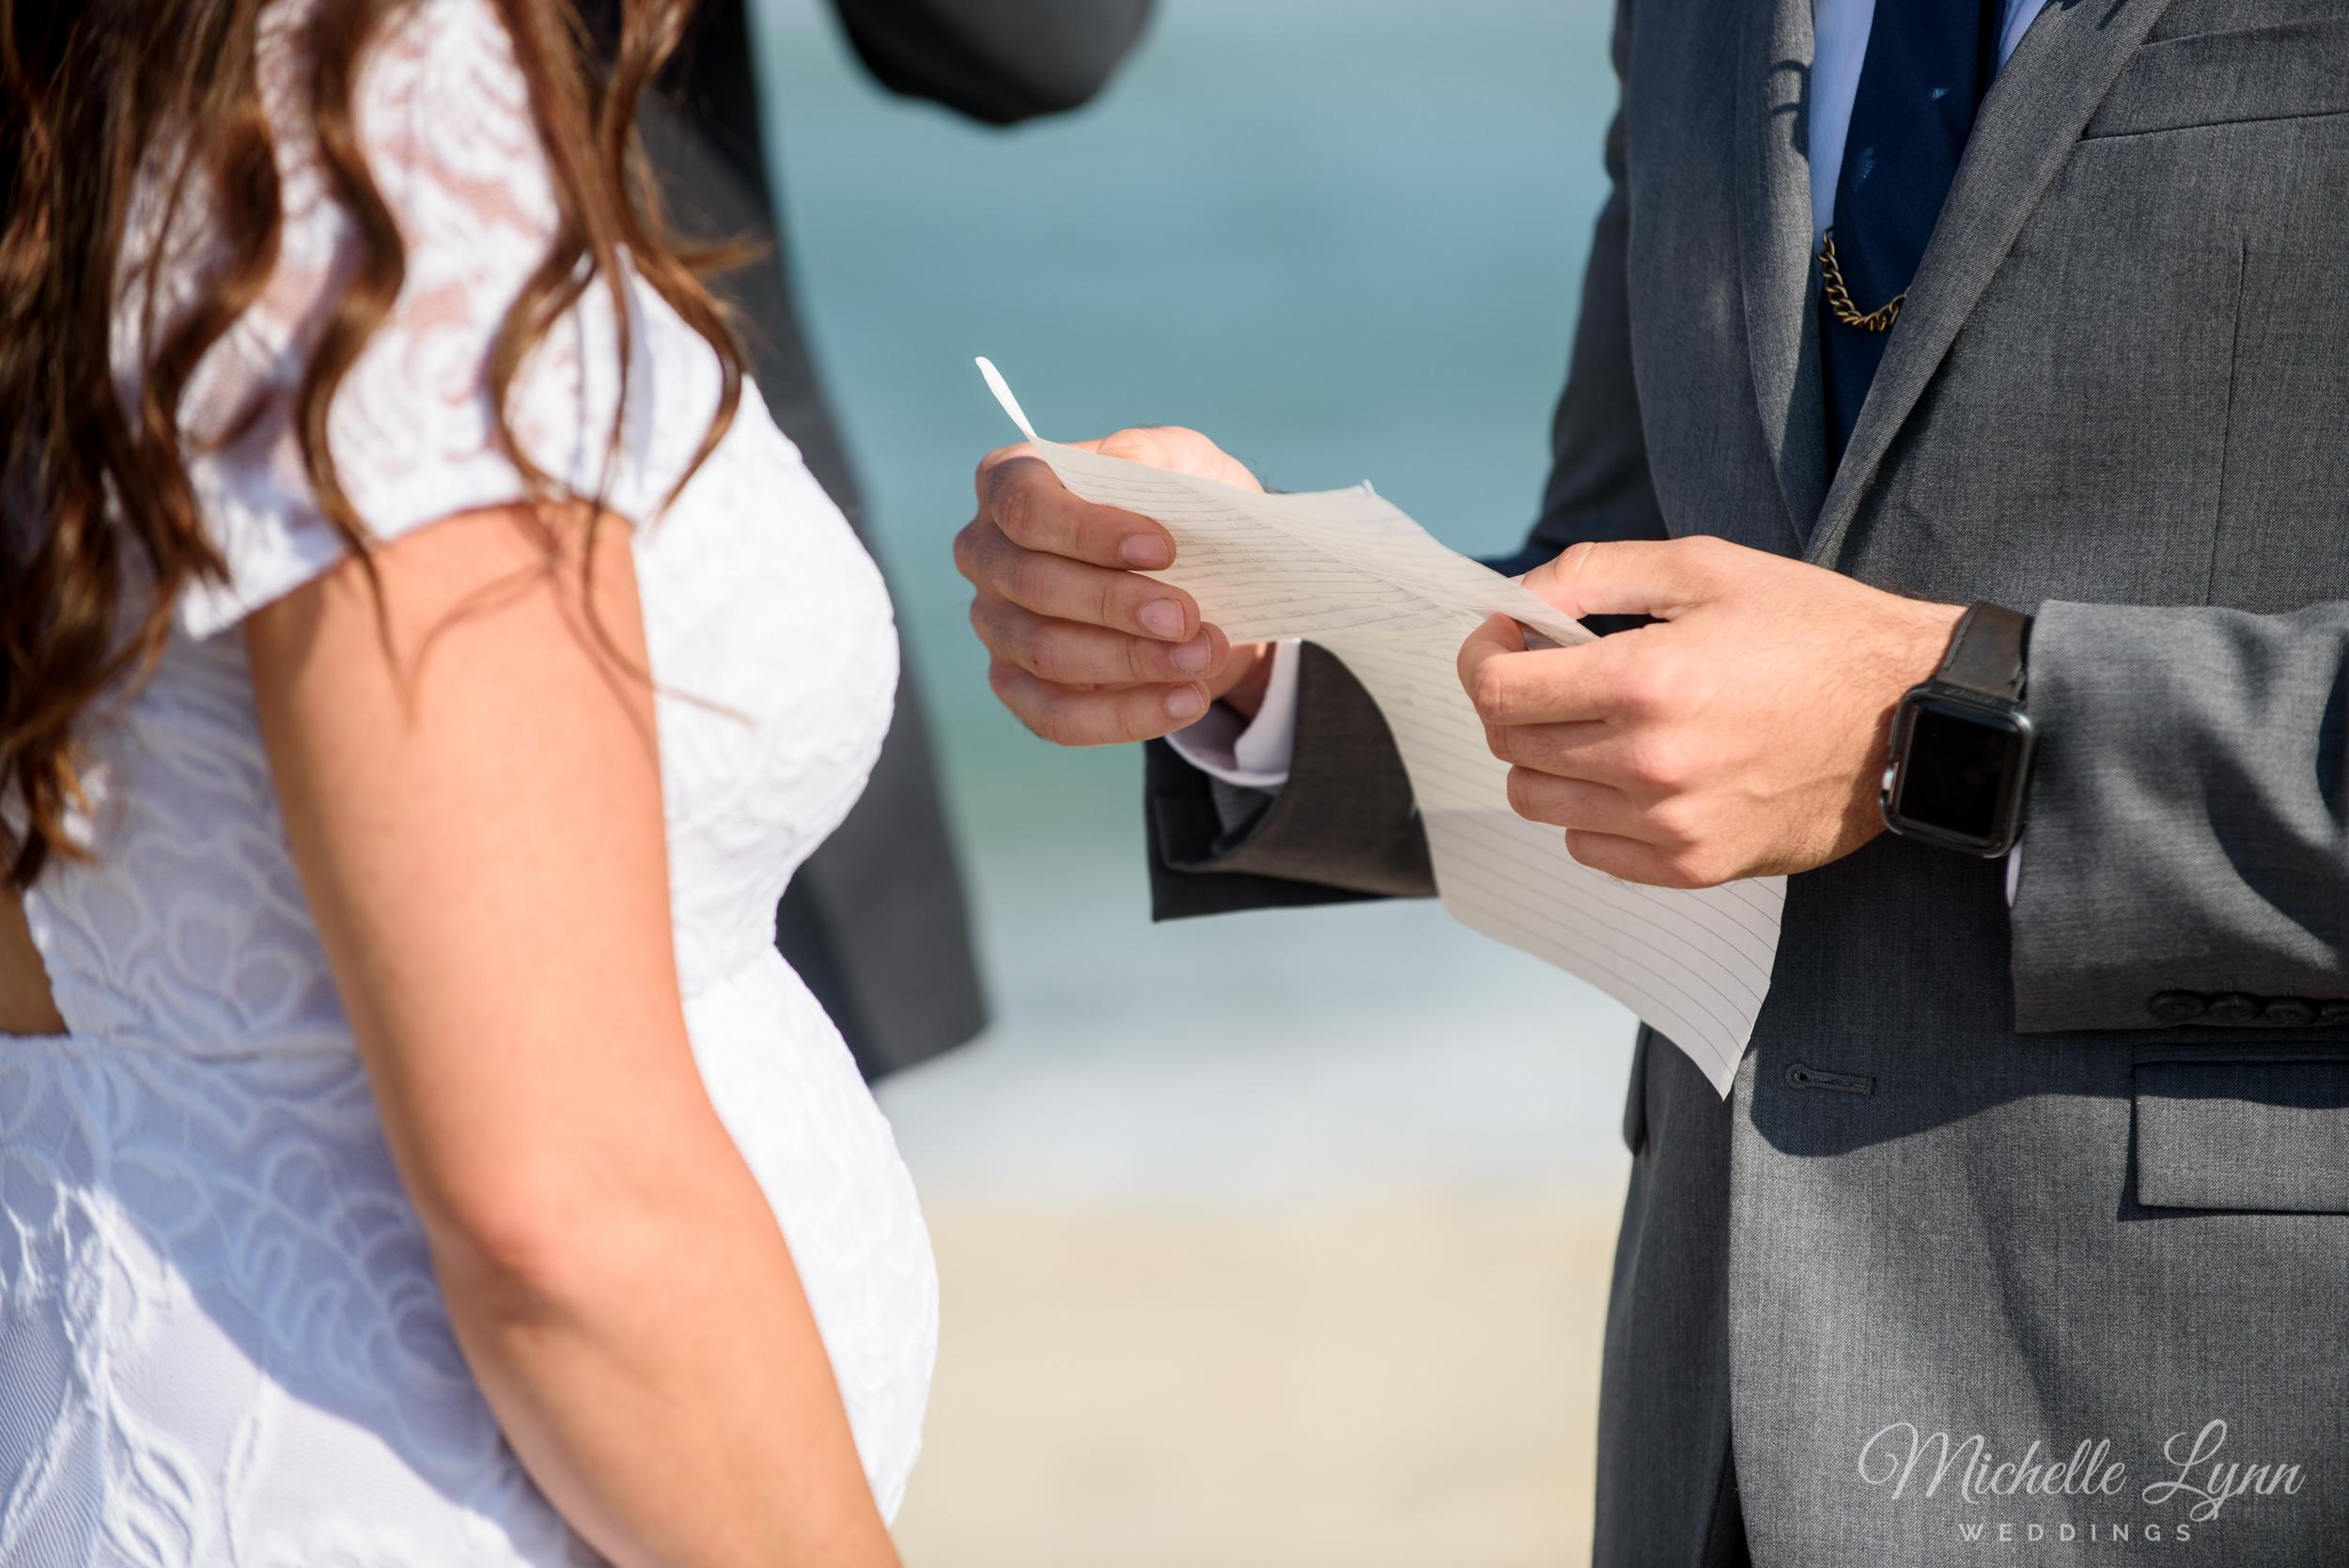 mlw-brant-beach-lbi-wedding-photography-24.jpg